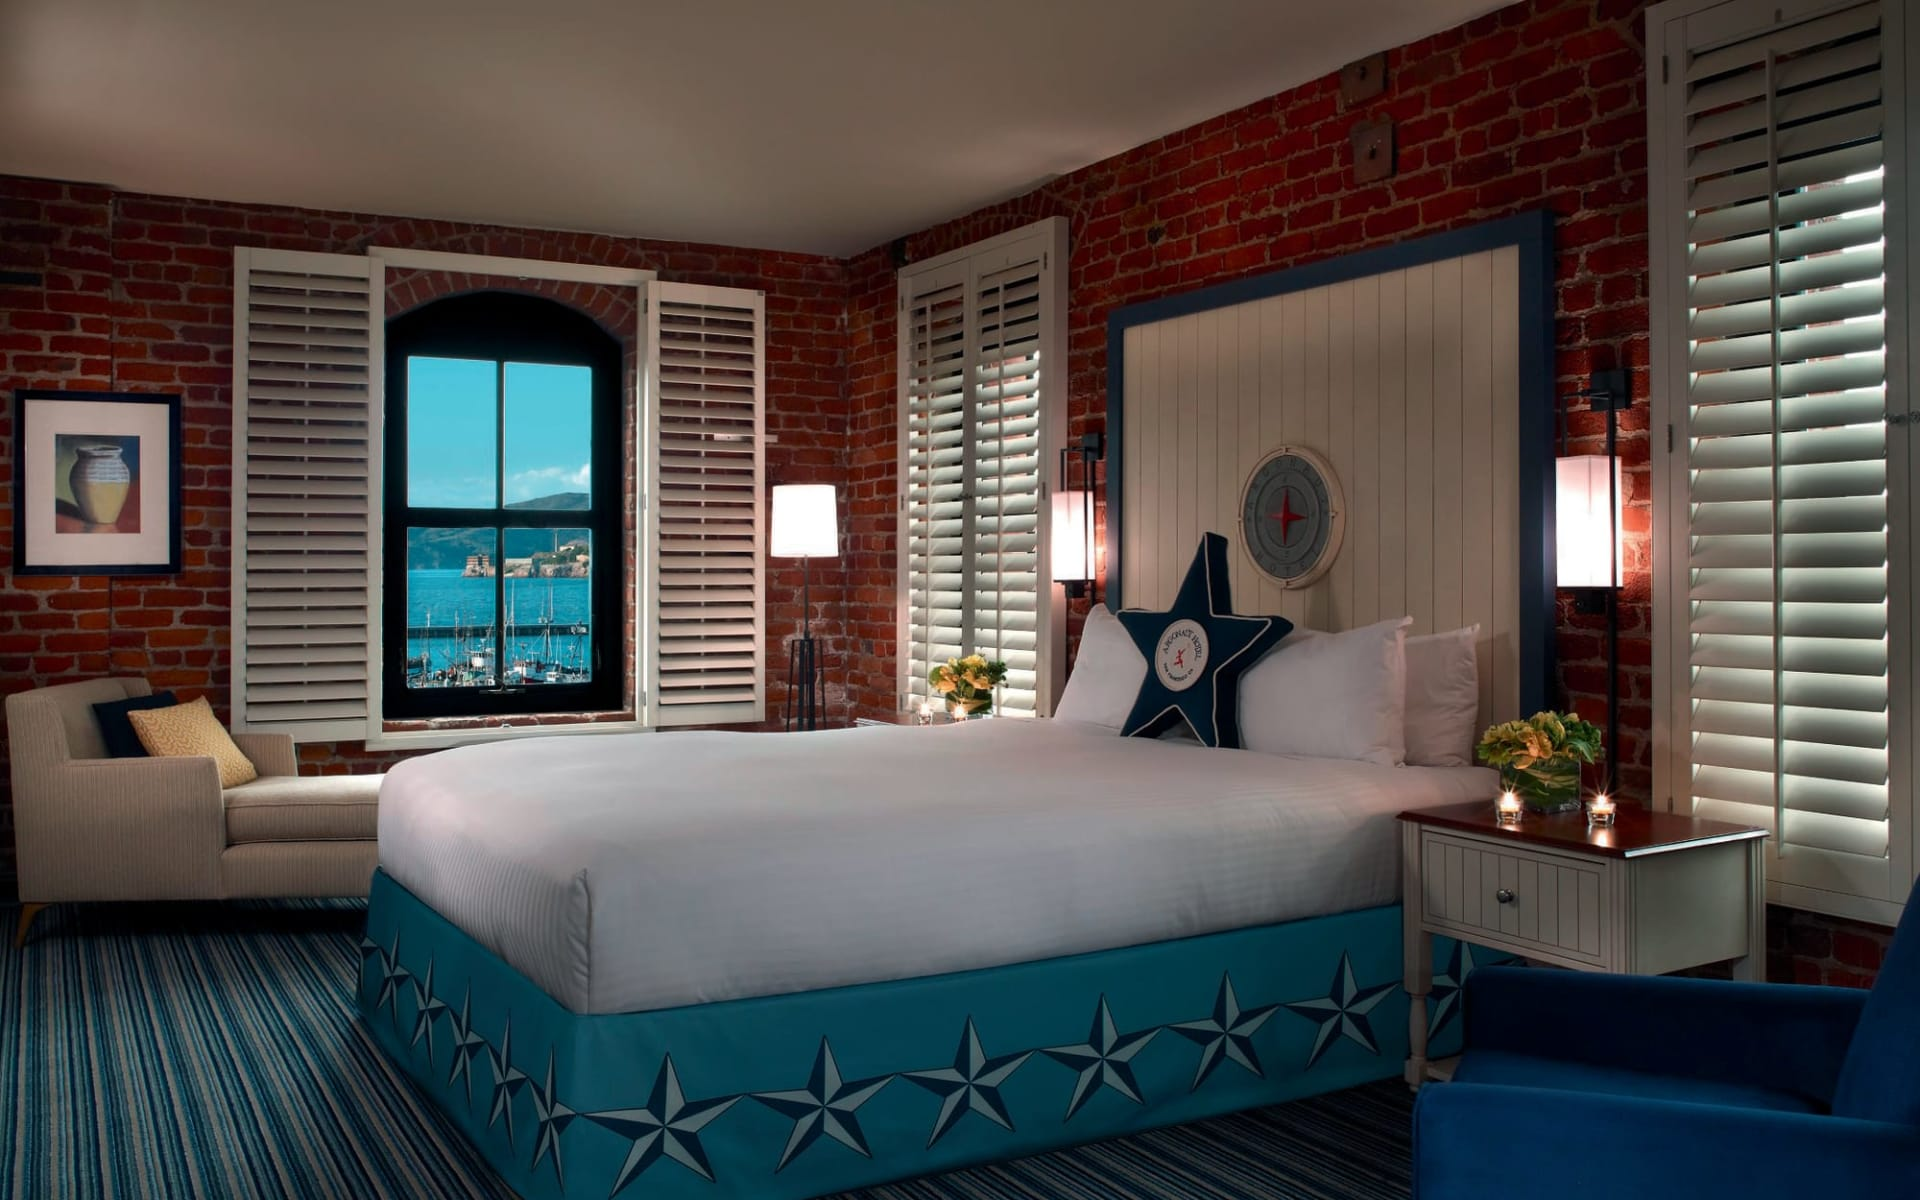 The Argonaut Hotel in San Francisco: zimmer the argonaut hotel doppelzimmer